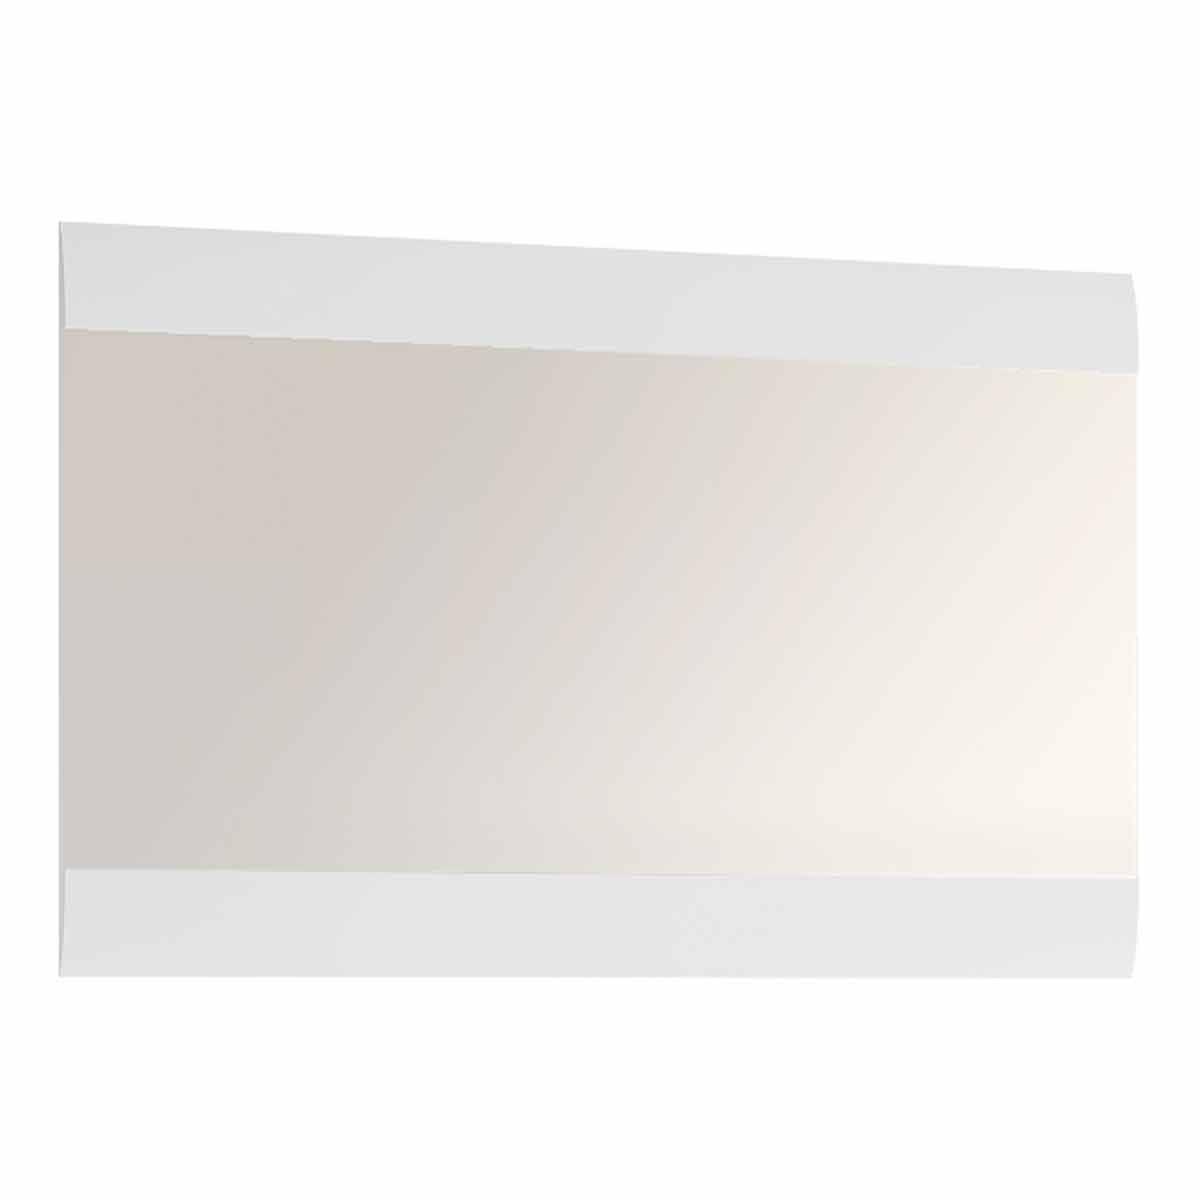 Chelsea Wall Mirror 109.5cm